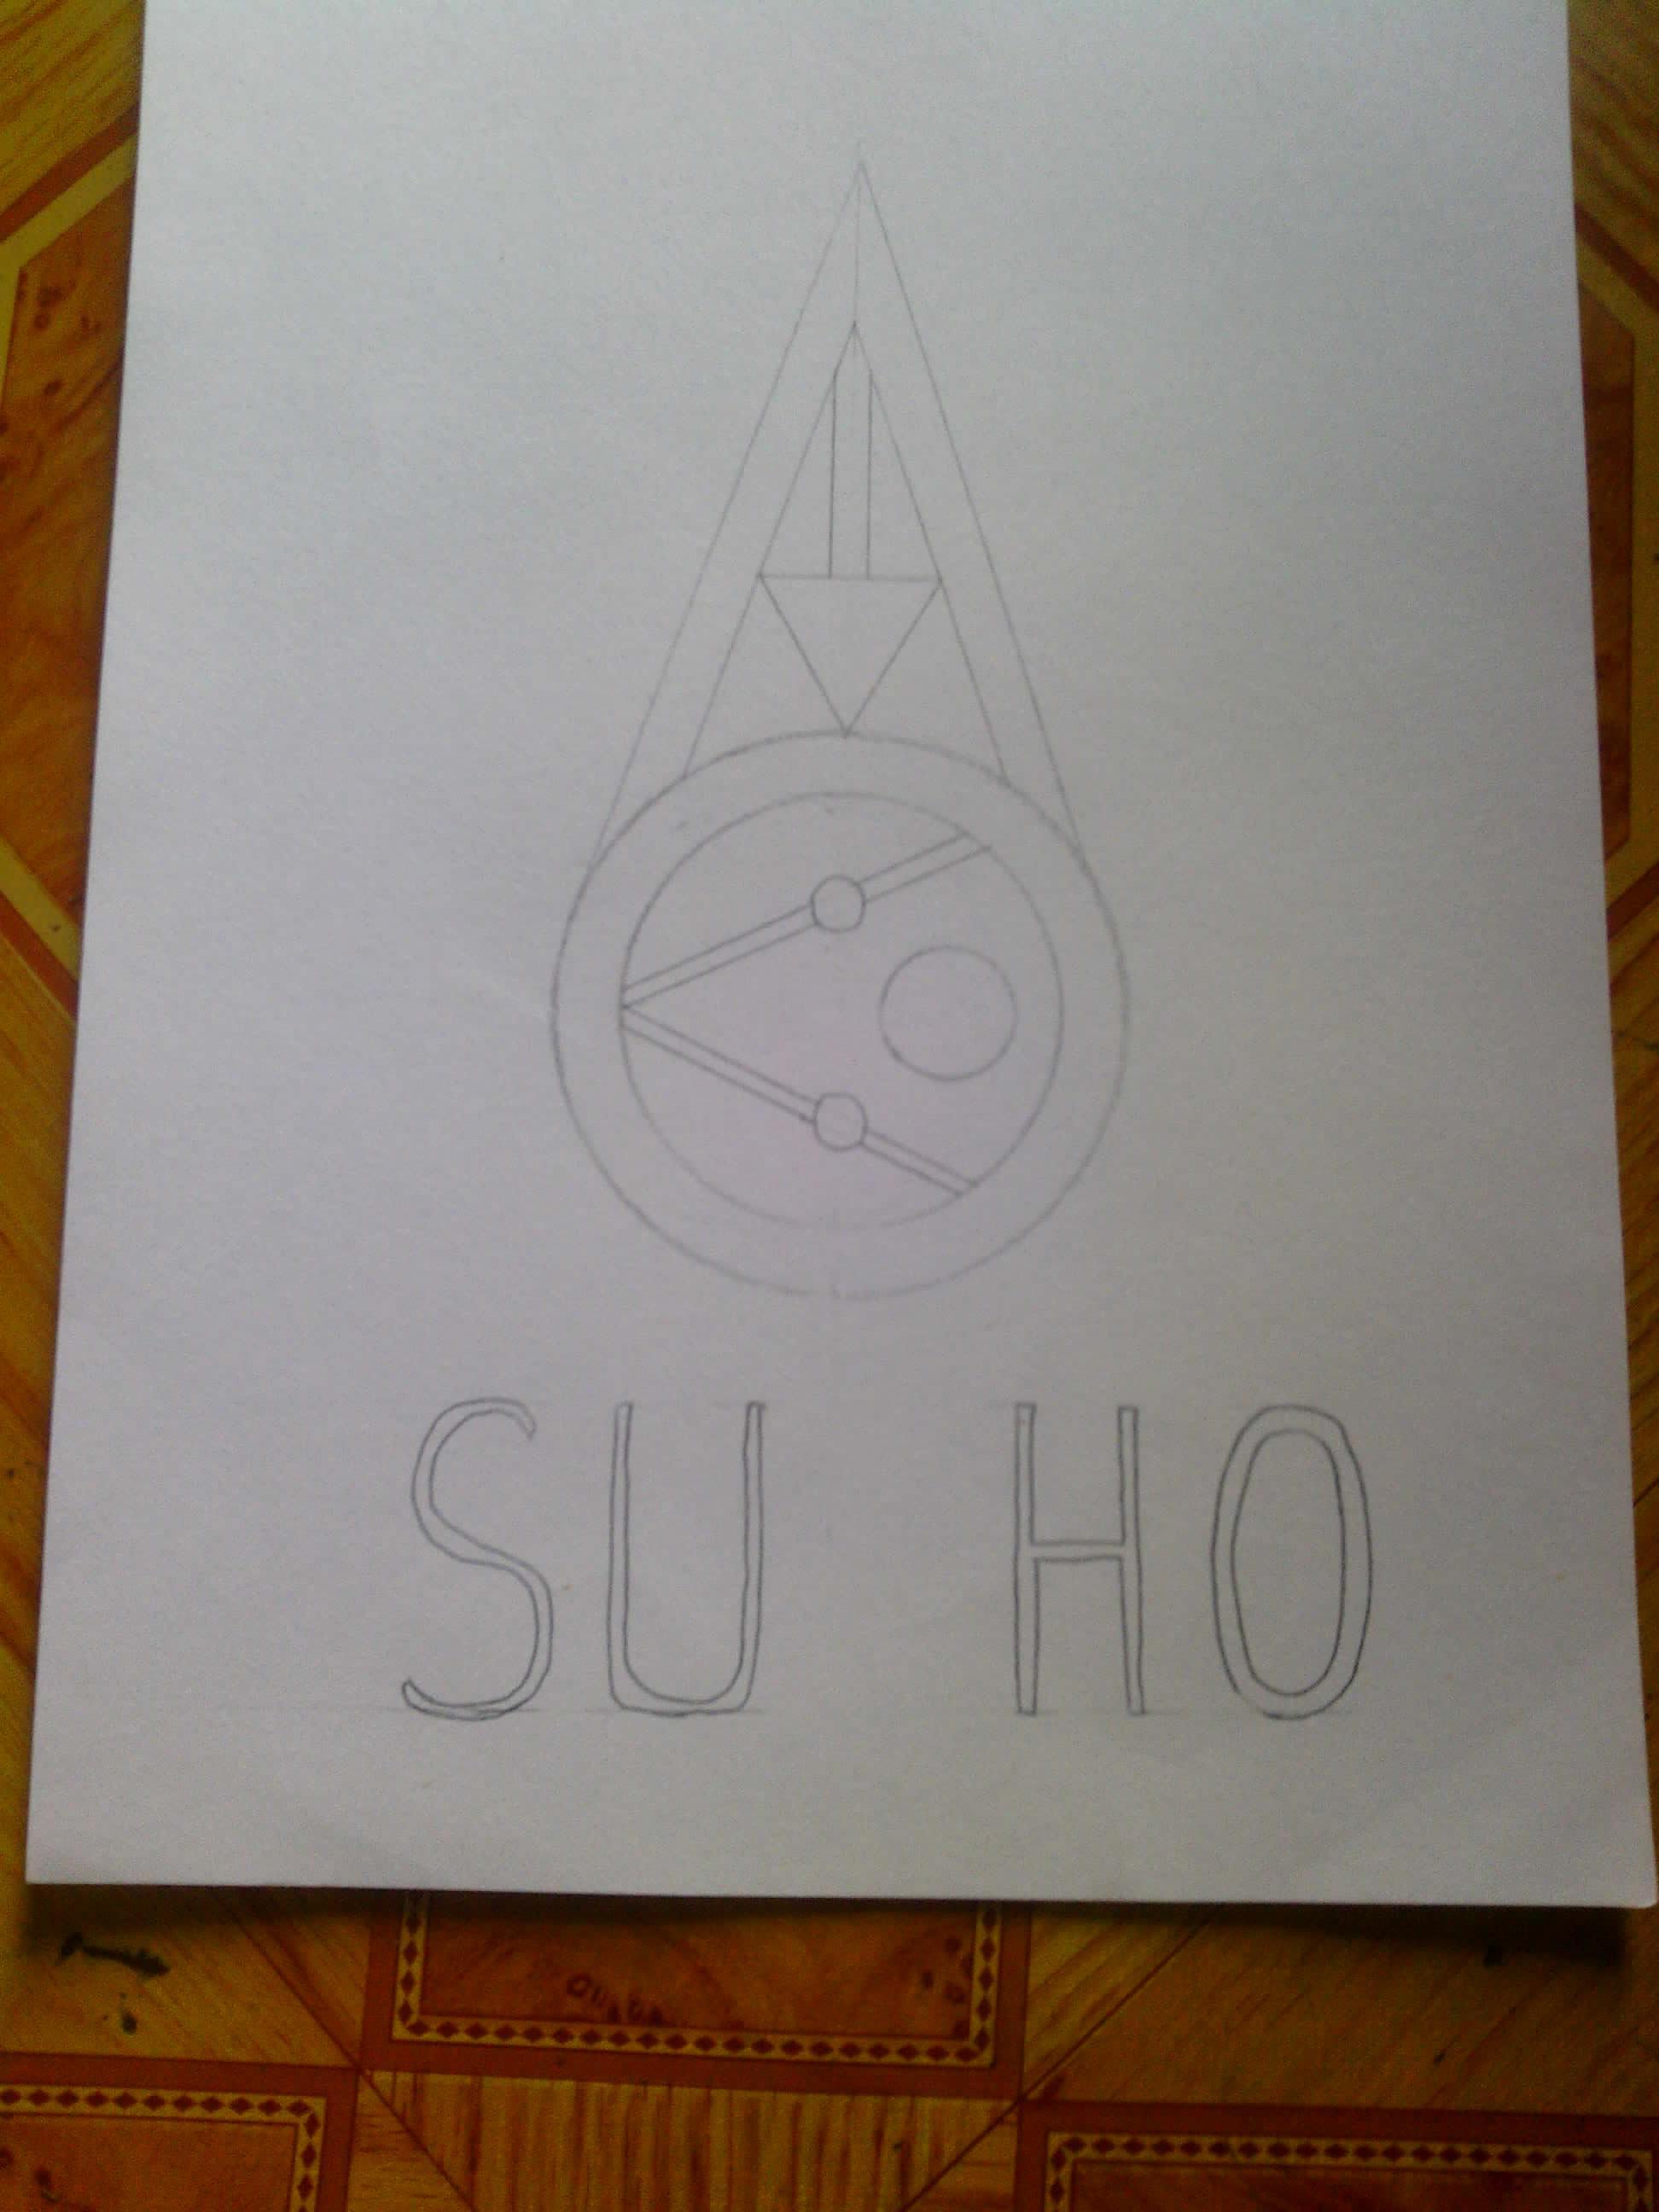 exo成员logo手绘图